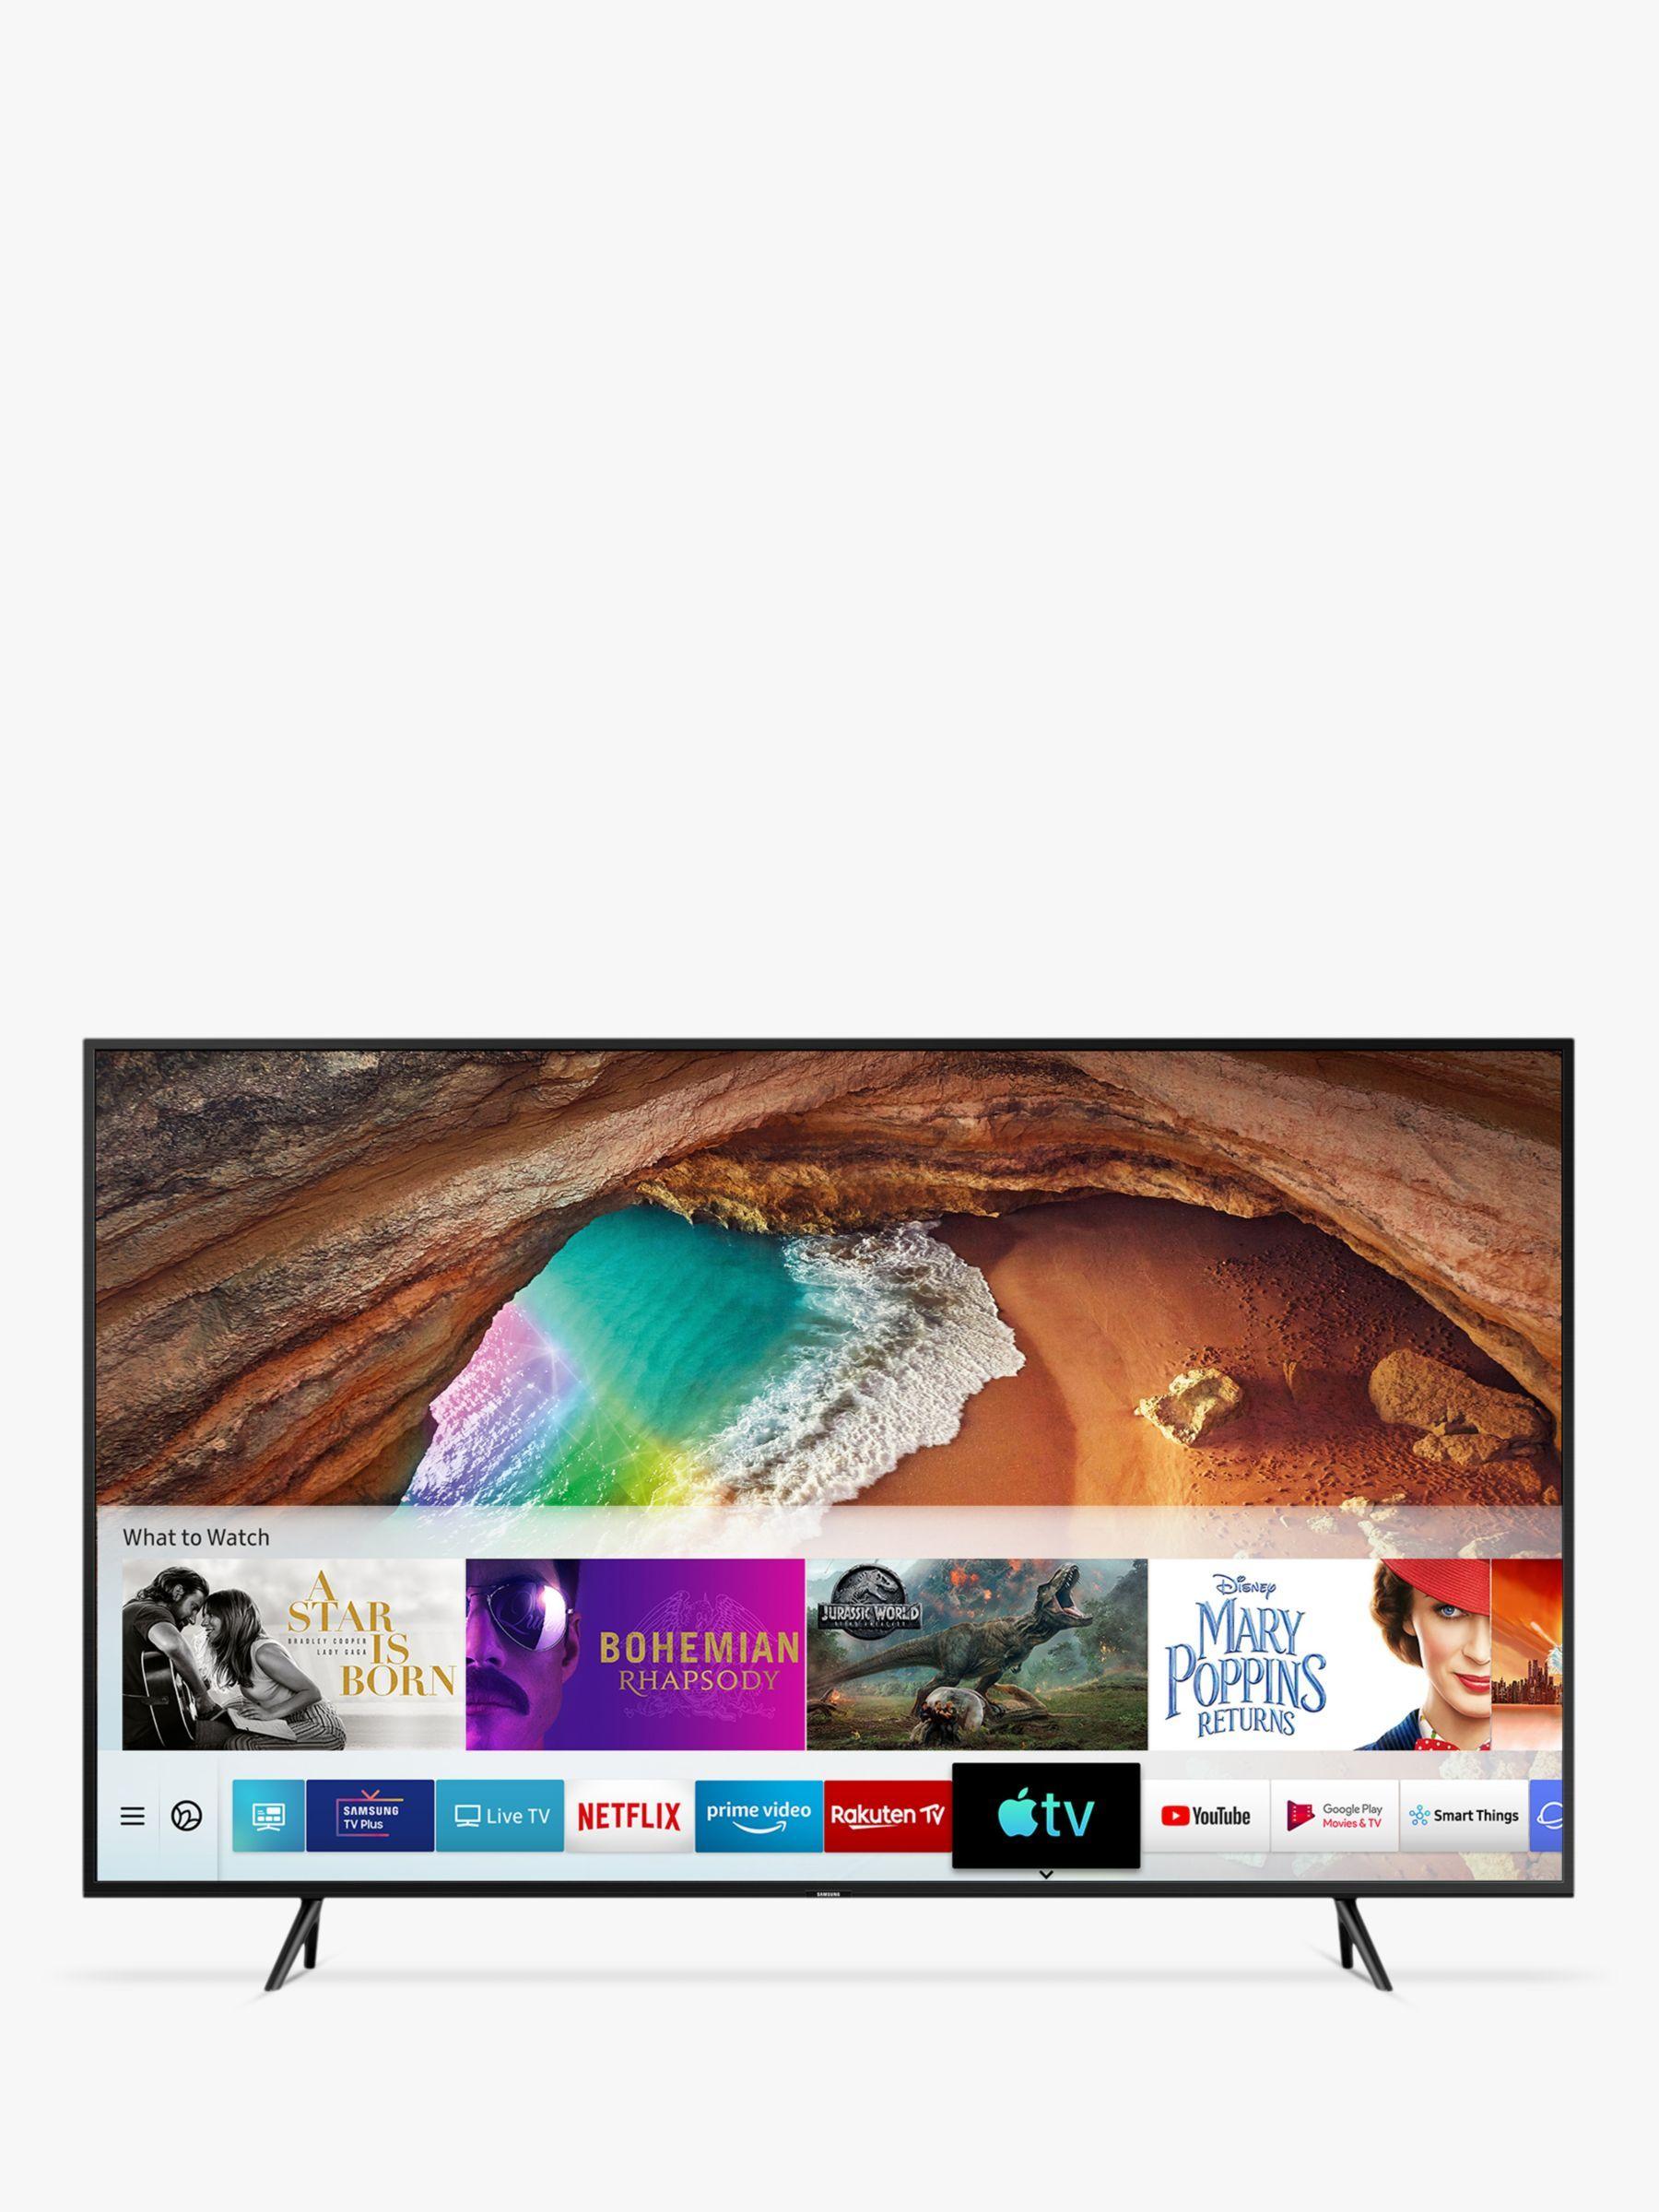 Samsung Qe65q60r 2019 Qled Hdr 4k Ultra Hd Smart Tv 65 With